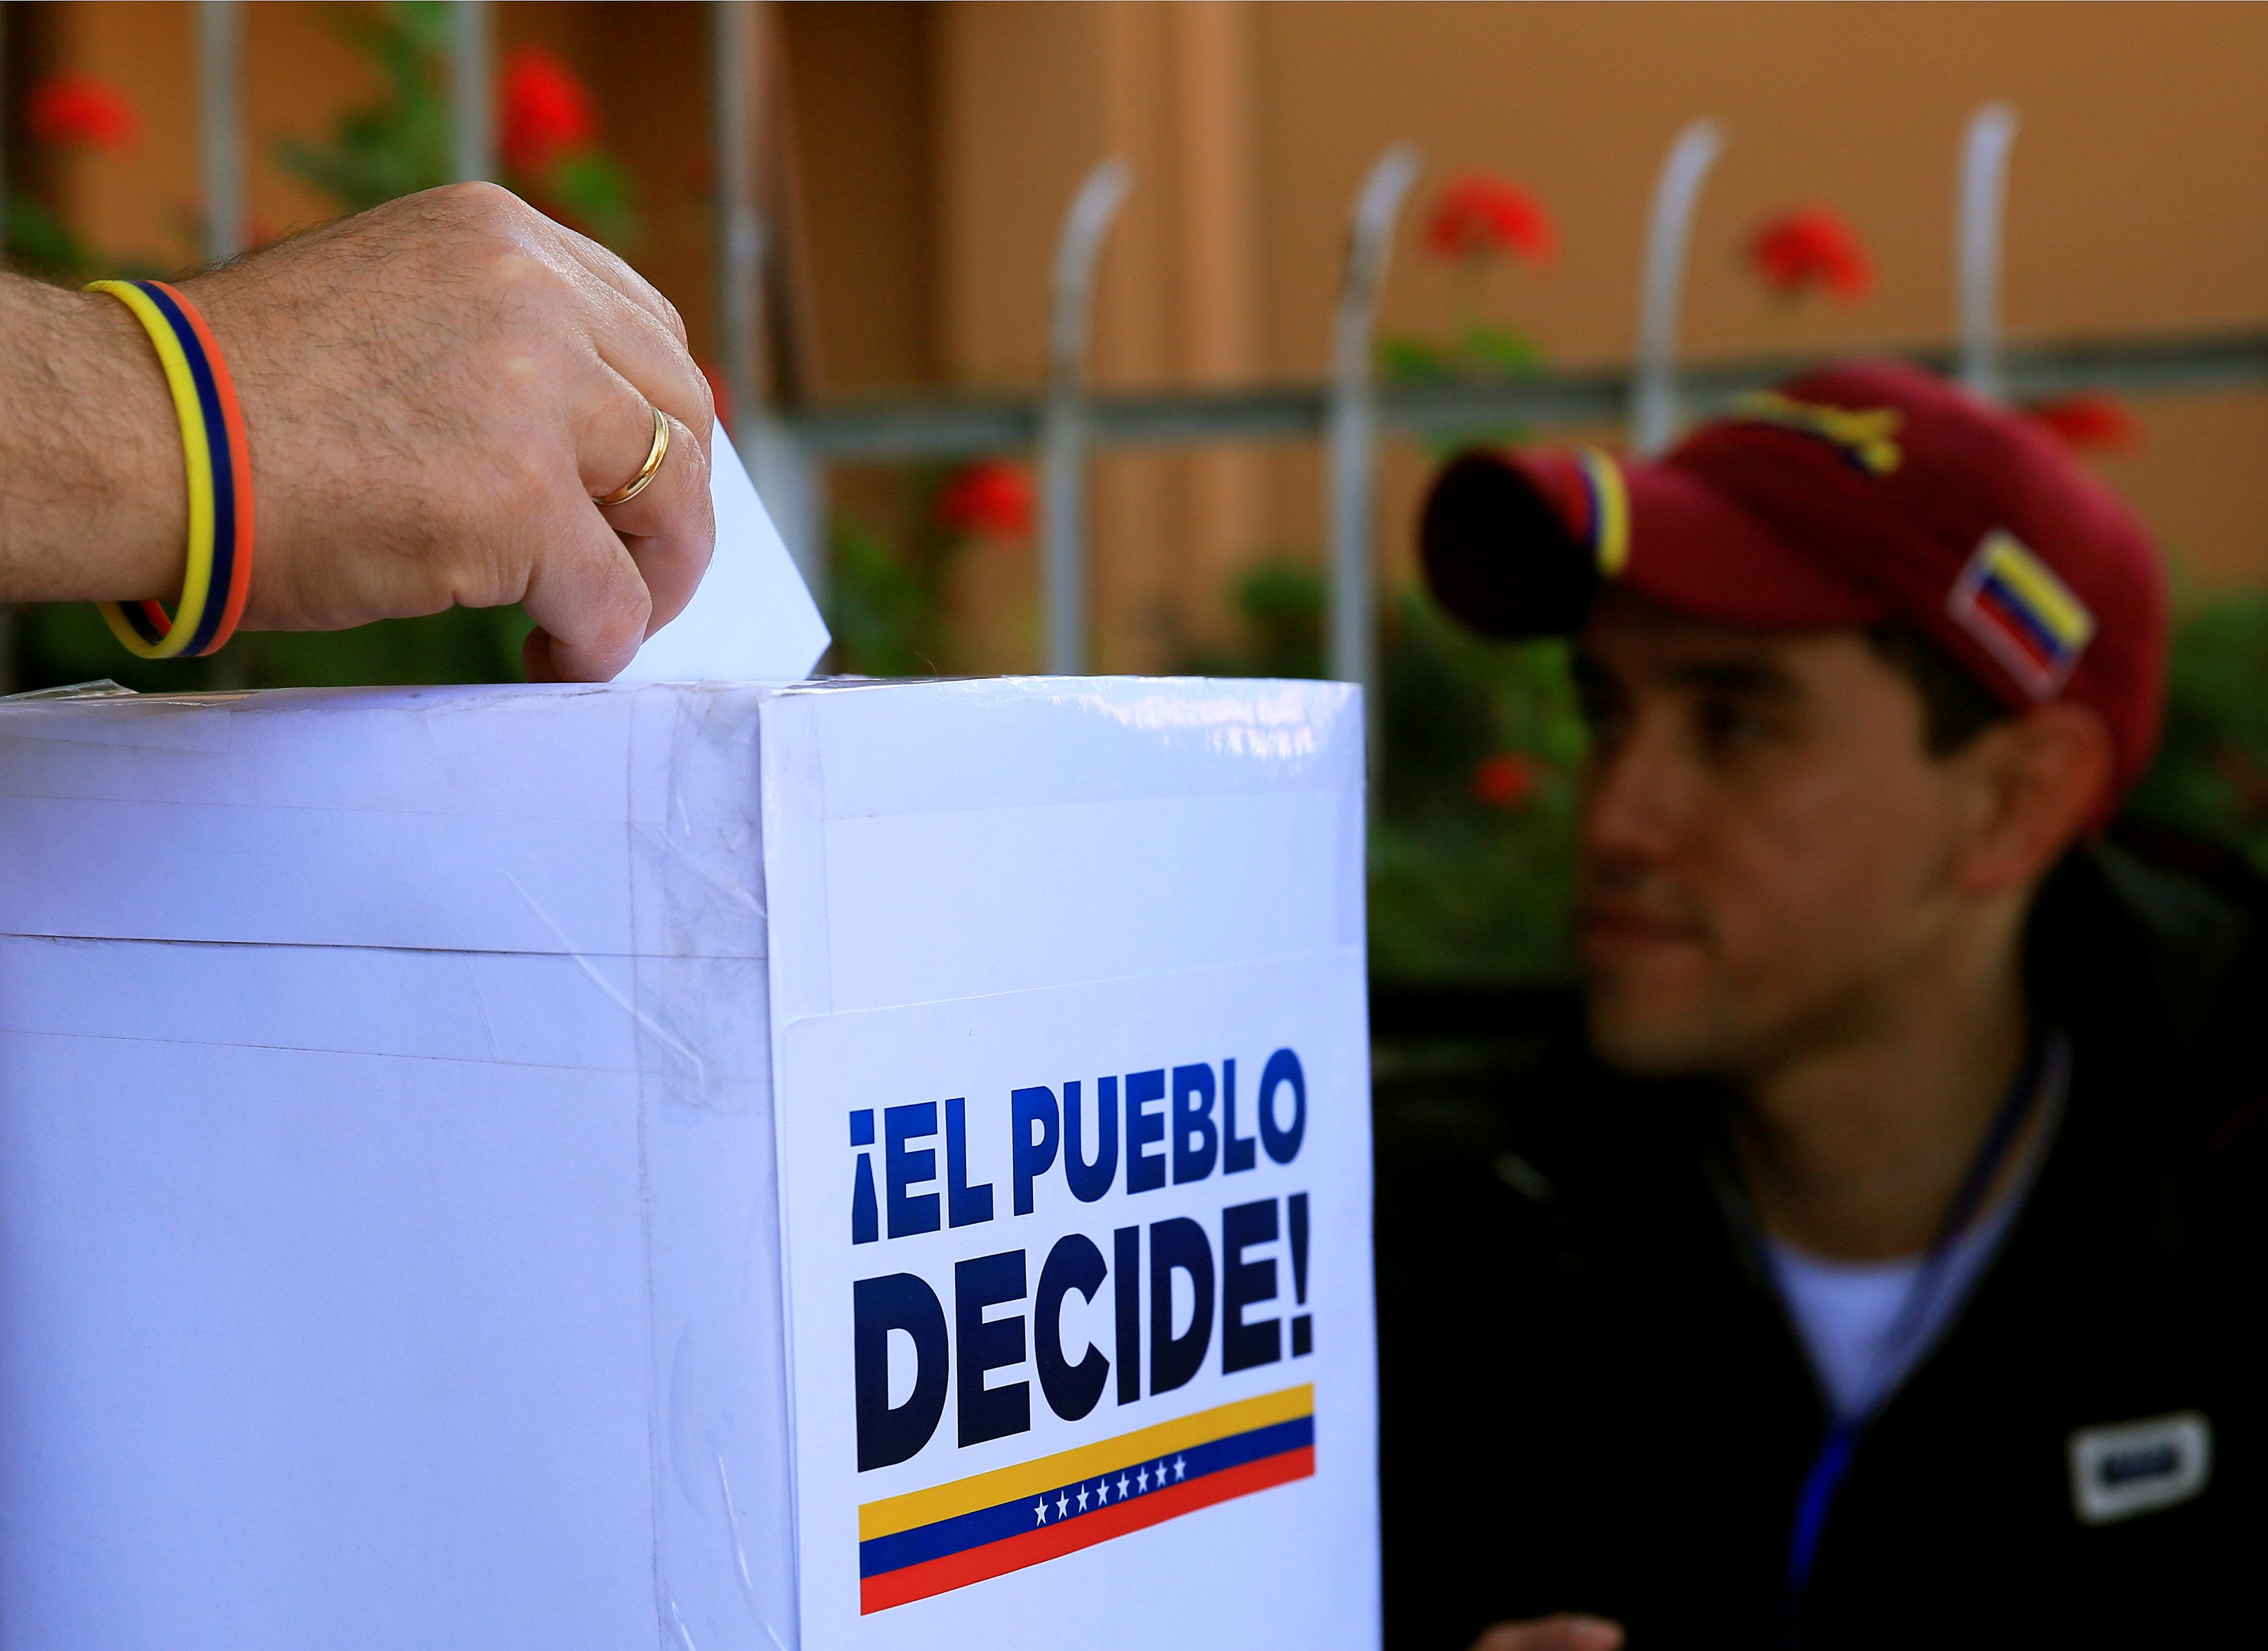 A man votes during an unofficial plebiscite against Venezuela's President Nicolas Maduro's government, in La Paz, Bolivia, July 16, 2017. REUTERS/David Mercado